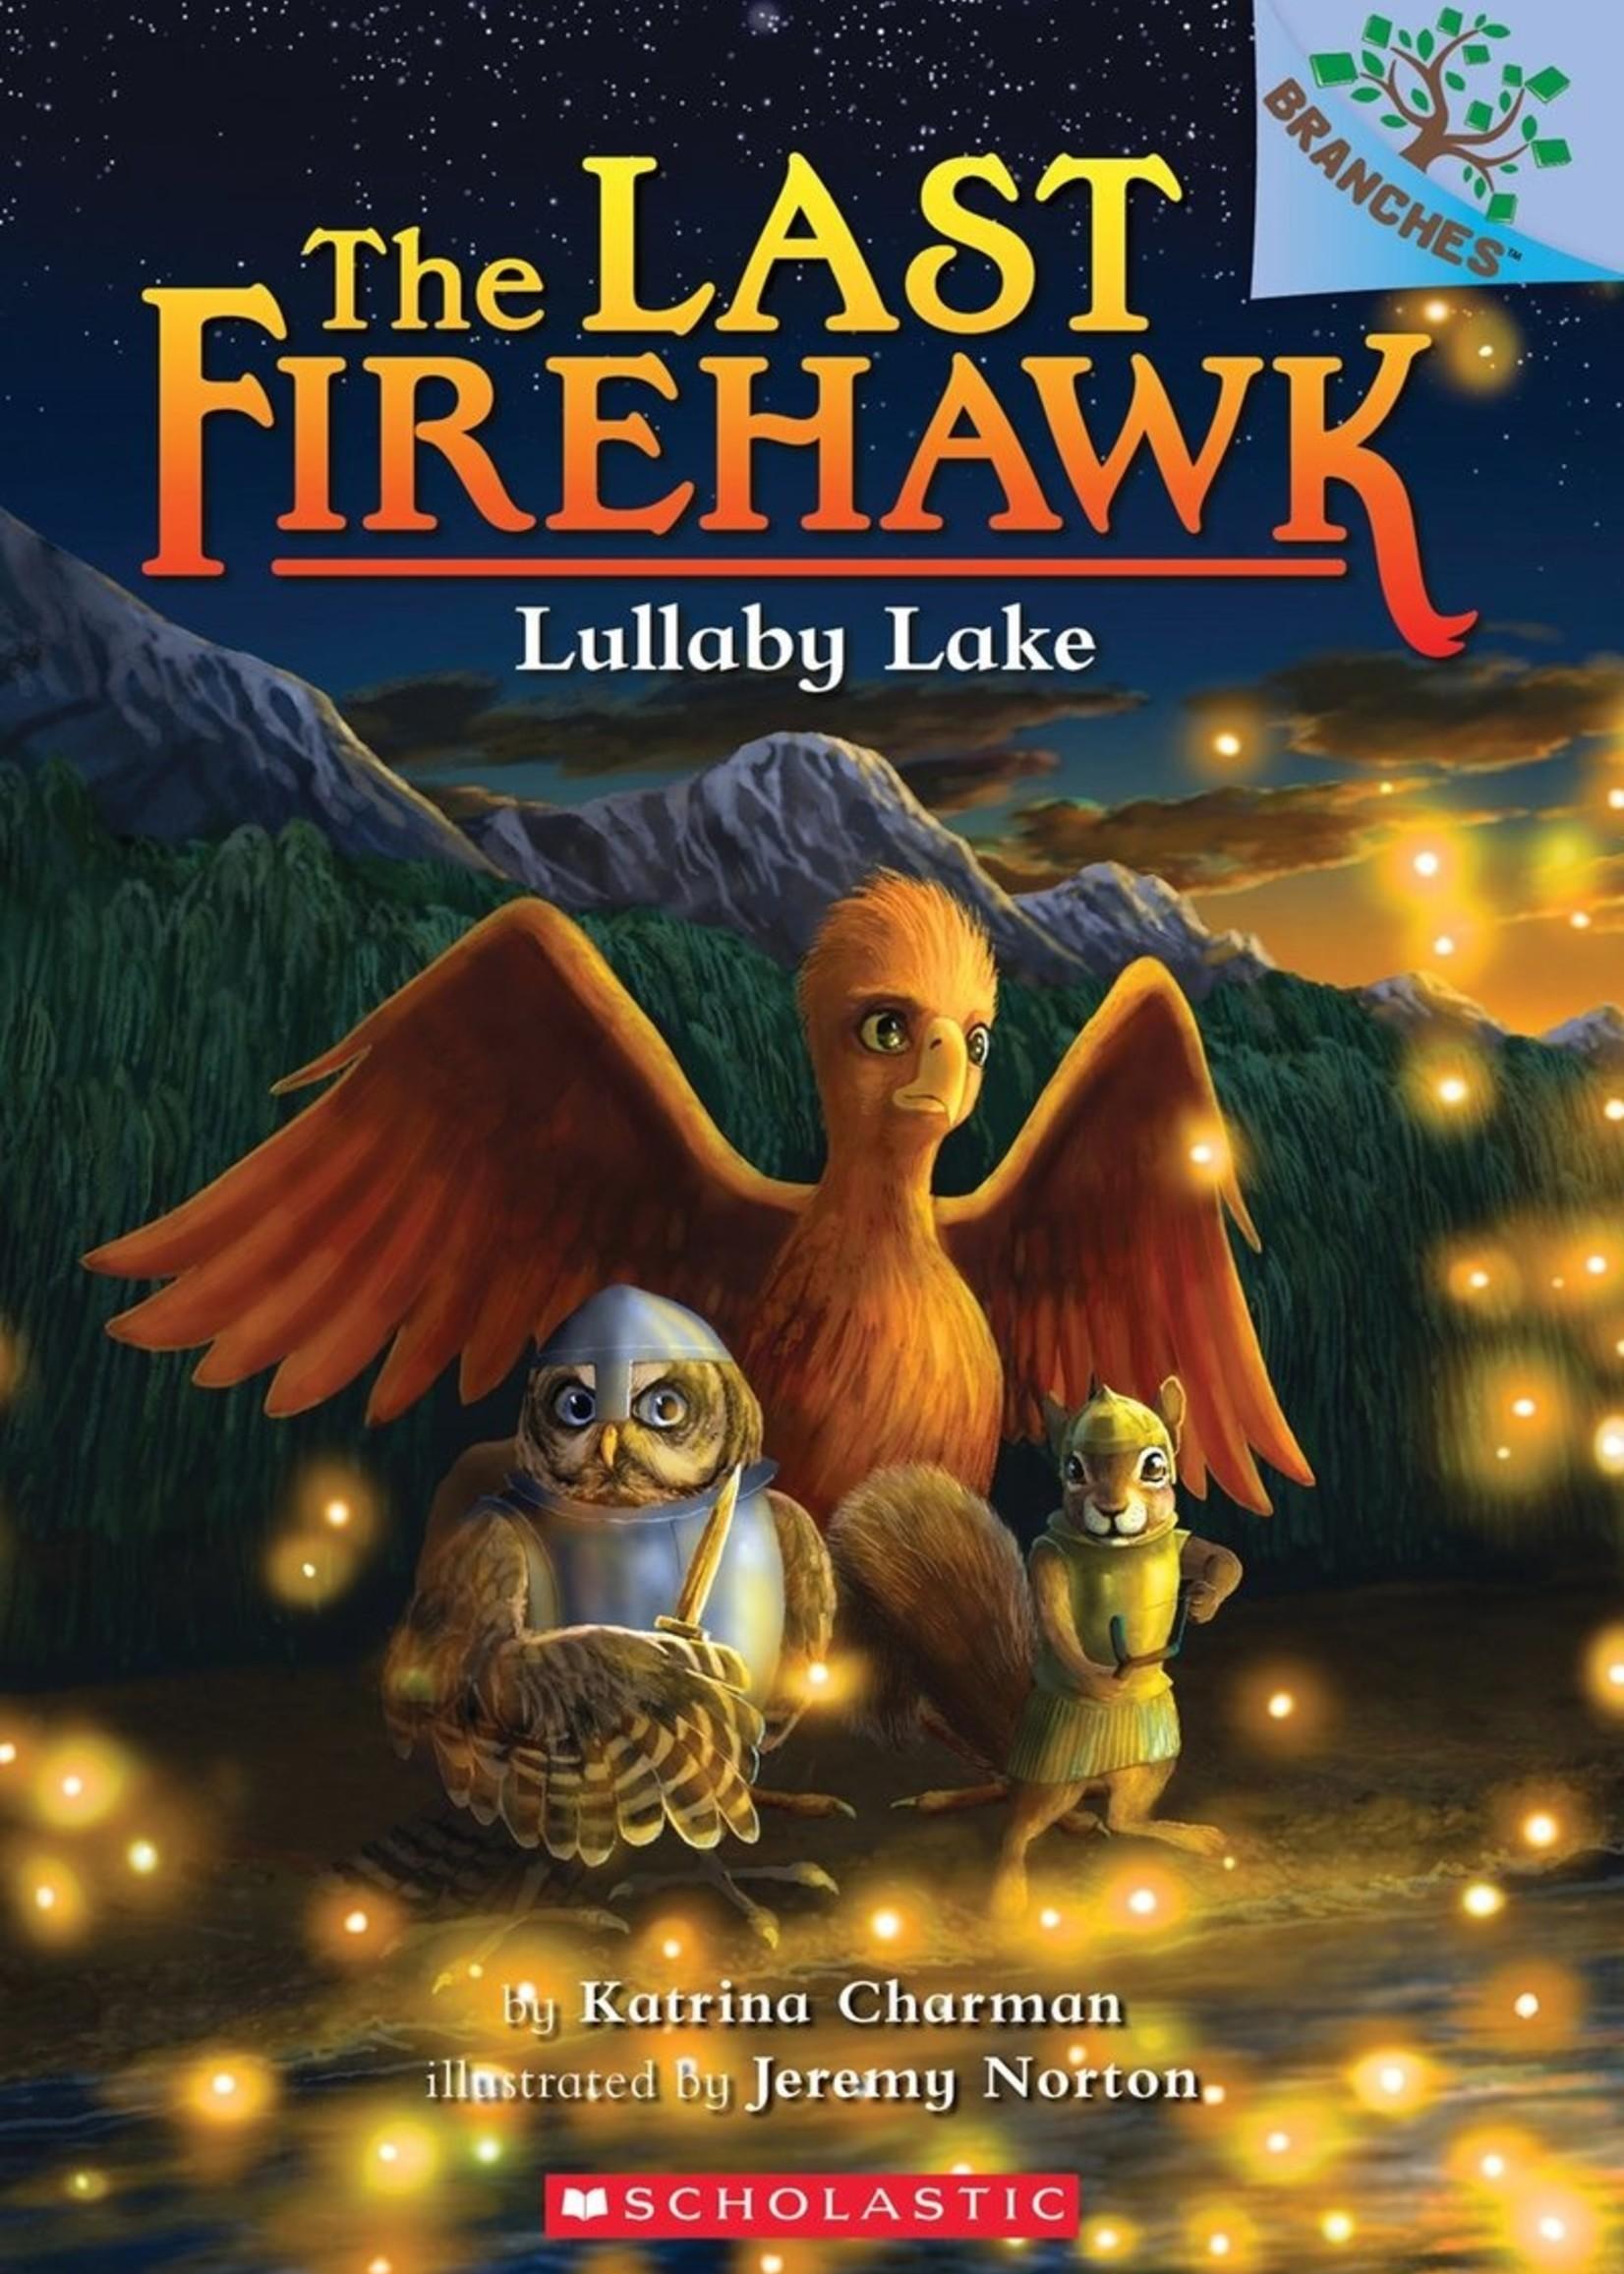 The Last Firehawk #04, Lullaby Lake - Paperback